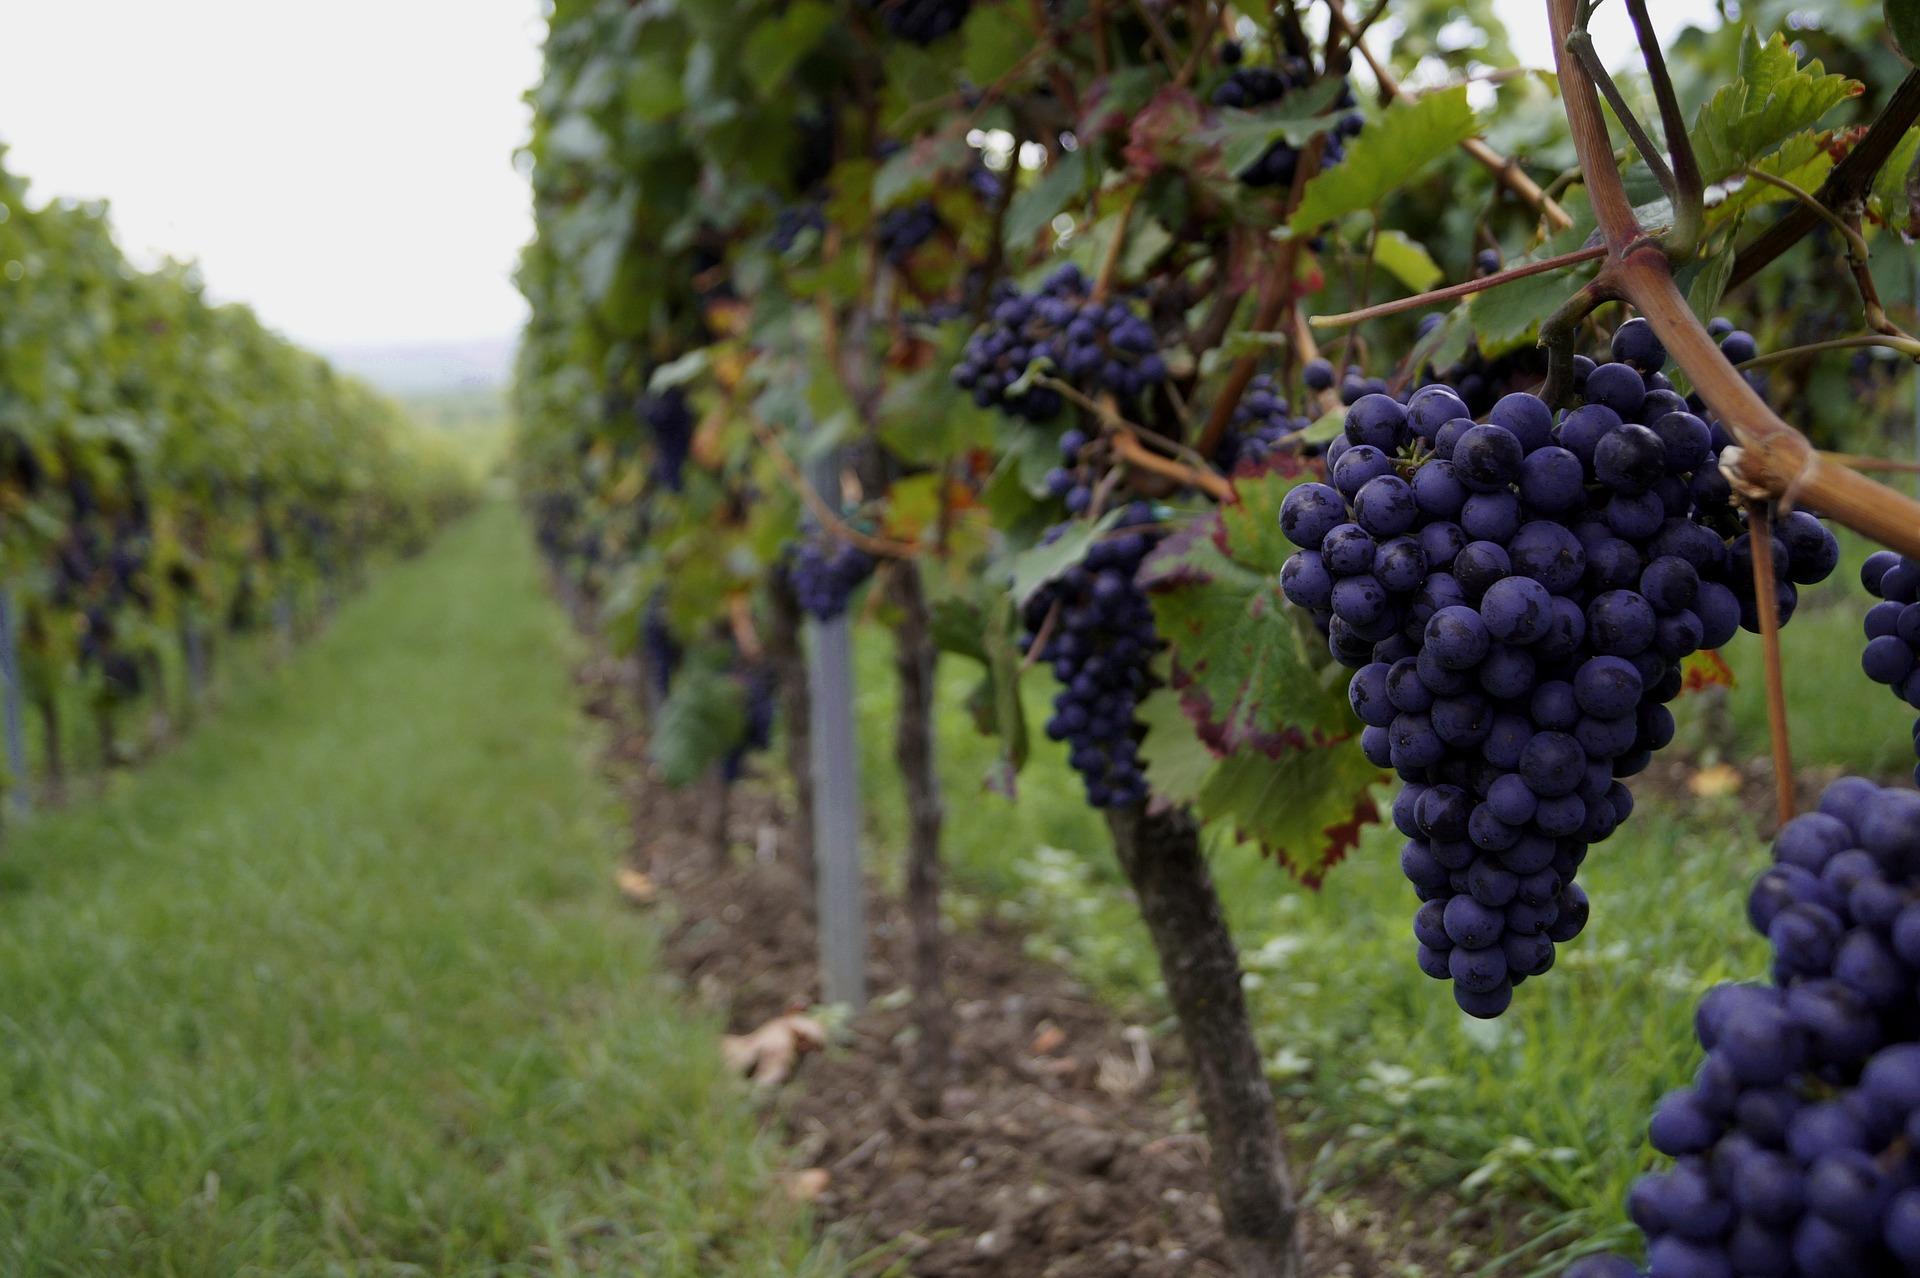 grapes-2560353_1920.jpg